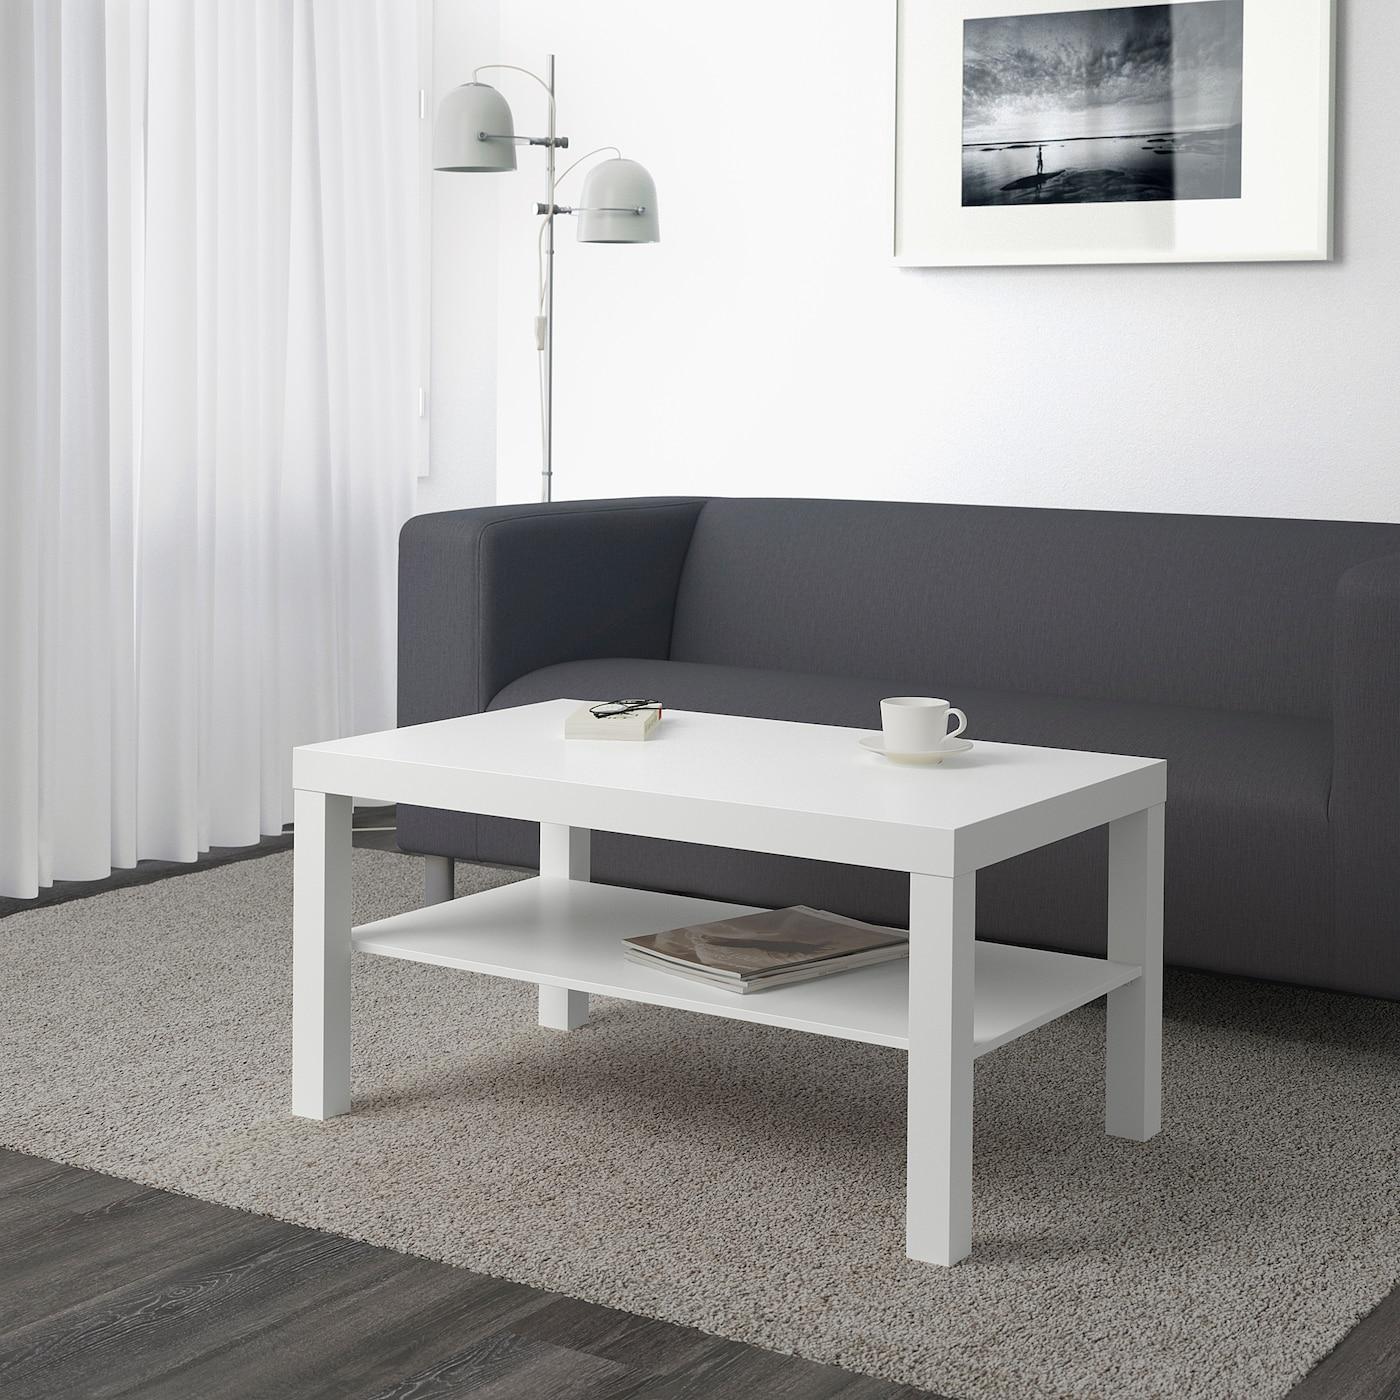 Lack Black Brown Coffee Table 118x78 Cm Ikea [ 1400 x 1400 Pixel ]